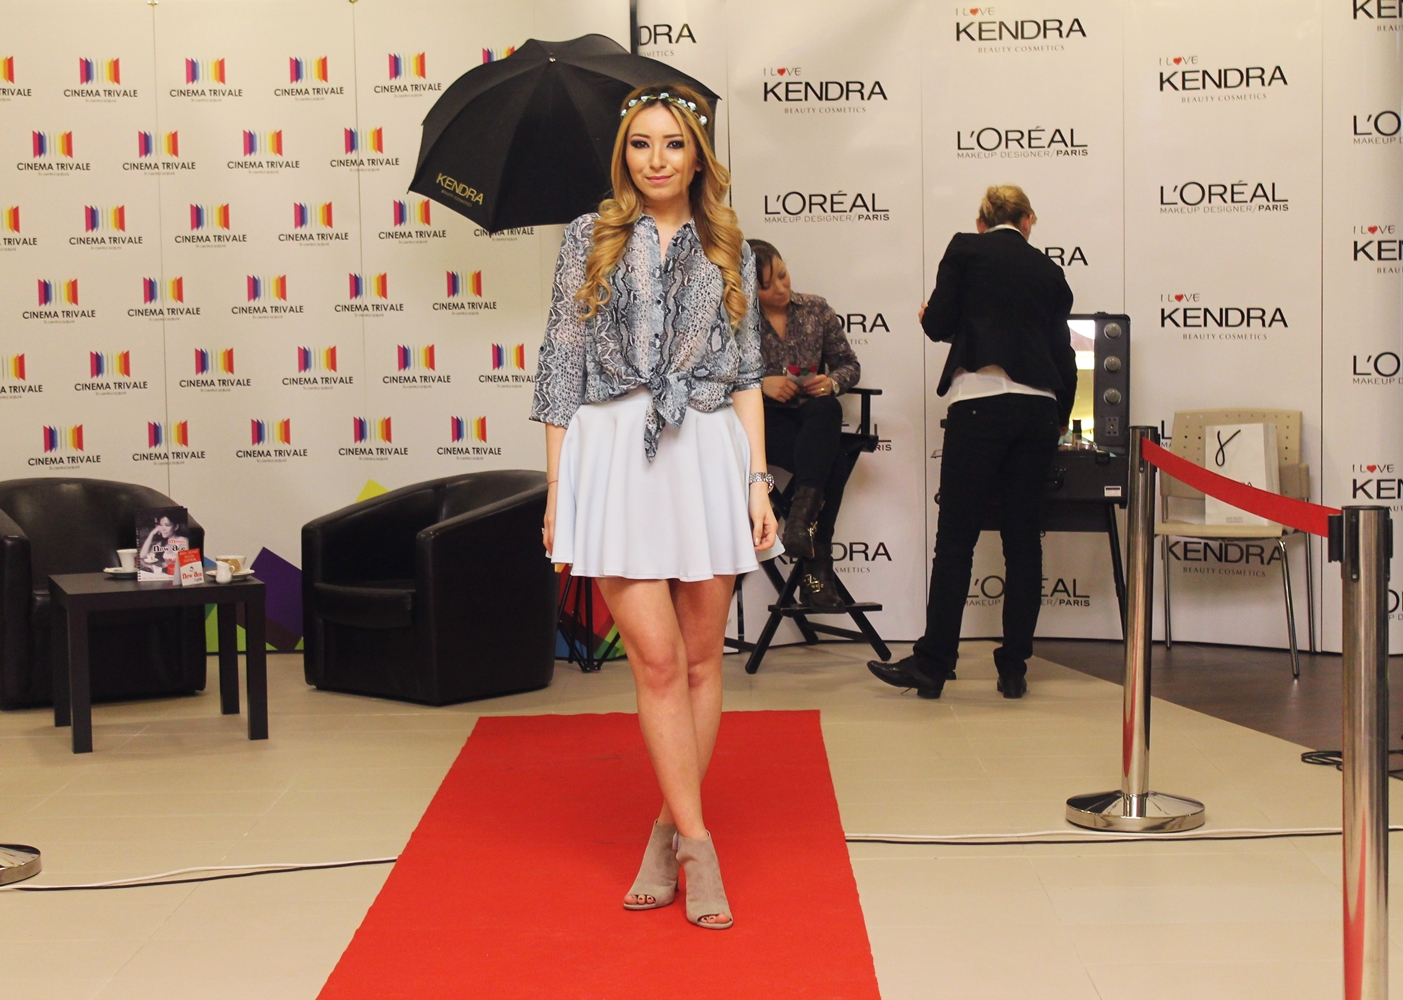 Andreea Design, tinuta cu fusta clos mare, pastelata, azuriu, fuste pe comanda, sandale deichmann, bloggerita, blogger, romania, arges